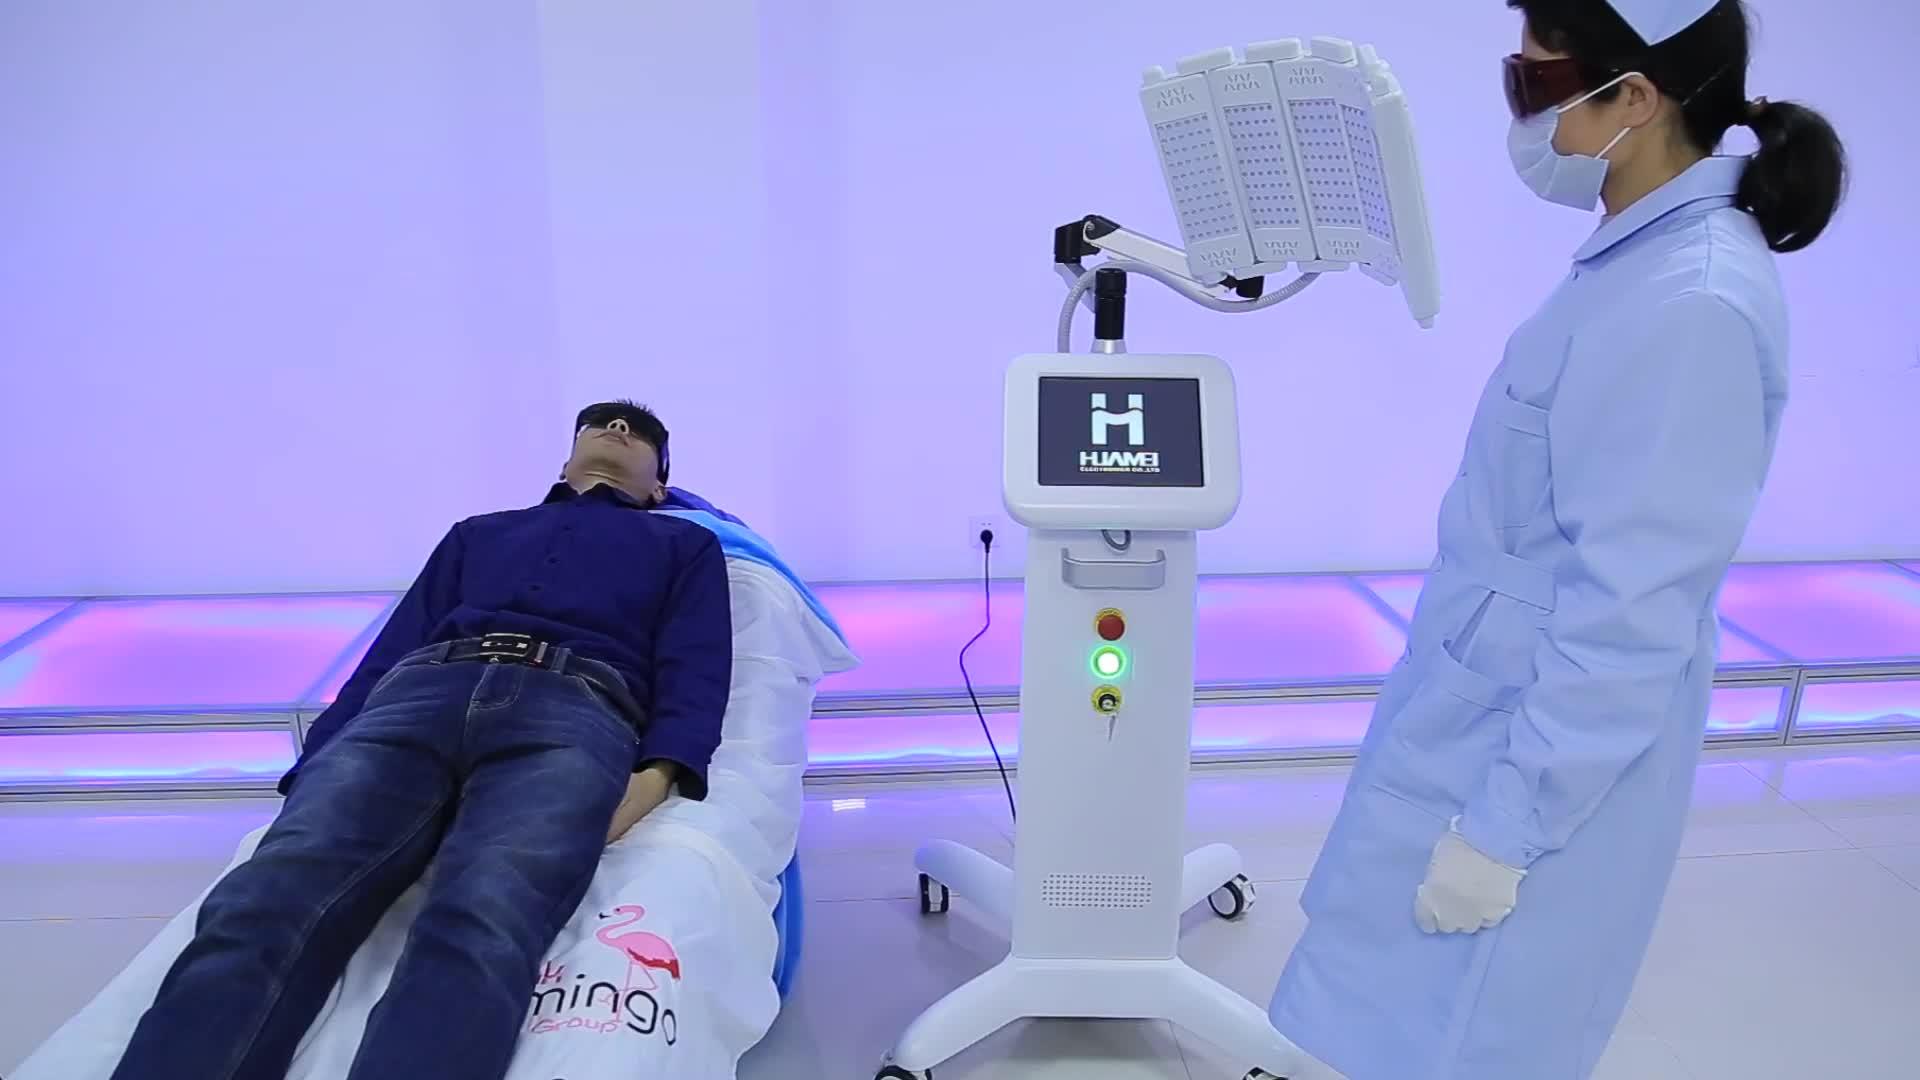 PDT LED מכונה טיפול פנים עור טיפול pdt Led טיפול באור אינפרא אדום לייזר סיליקון צהוב כחול מכונה Pdt